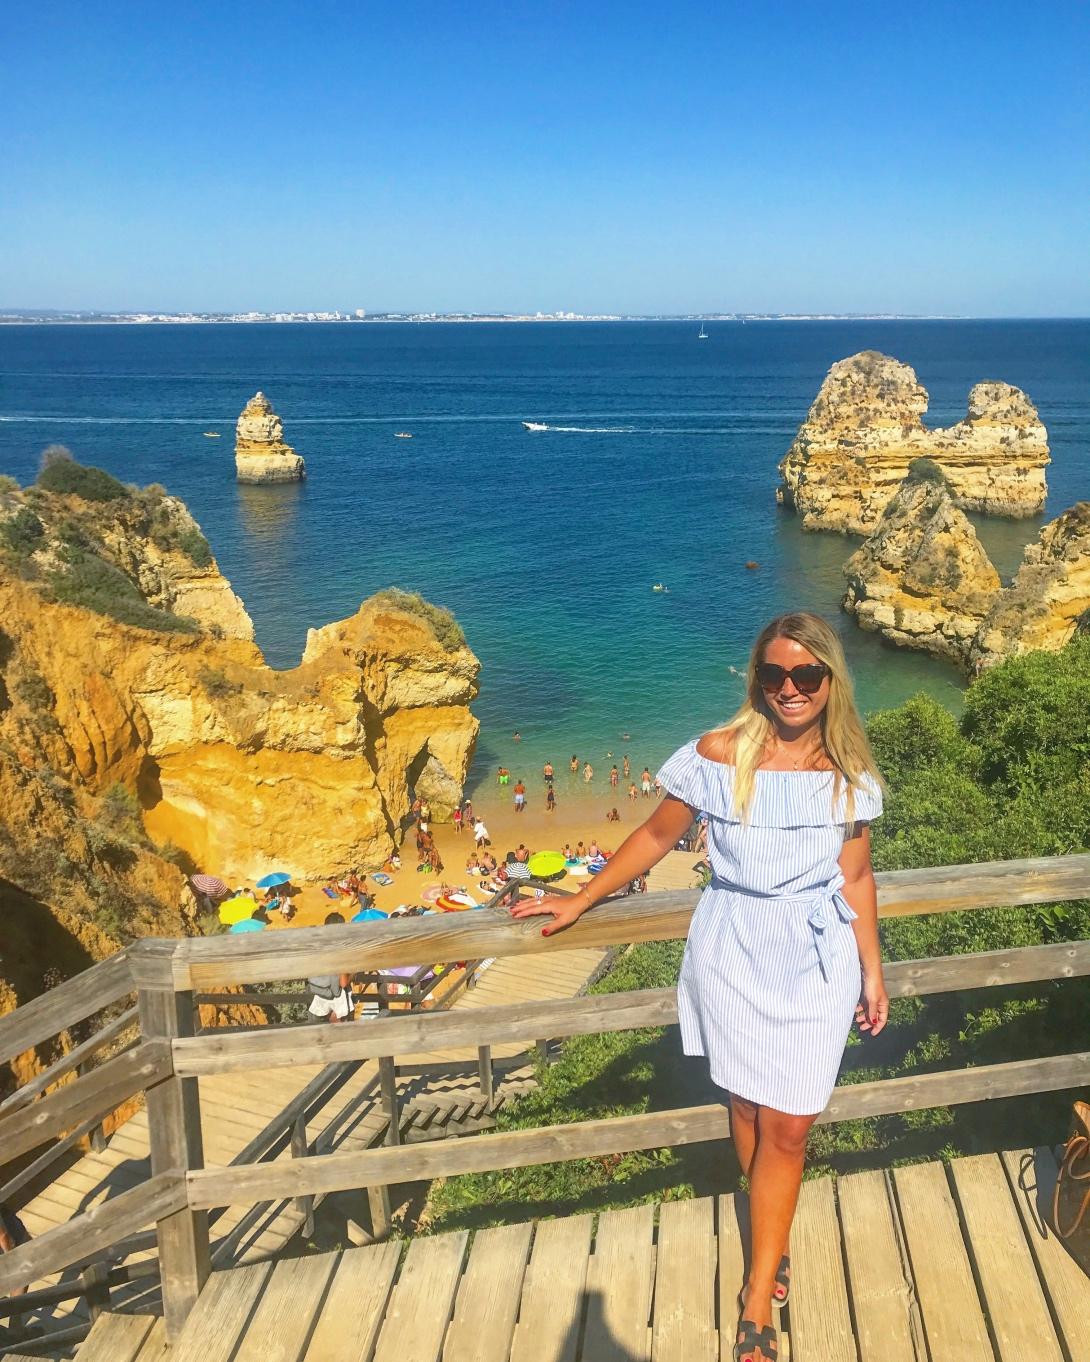 Praia de Camilho, Algarve